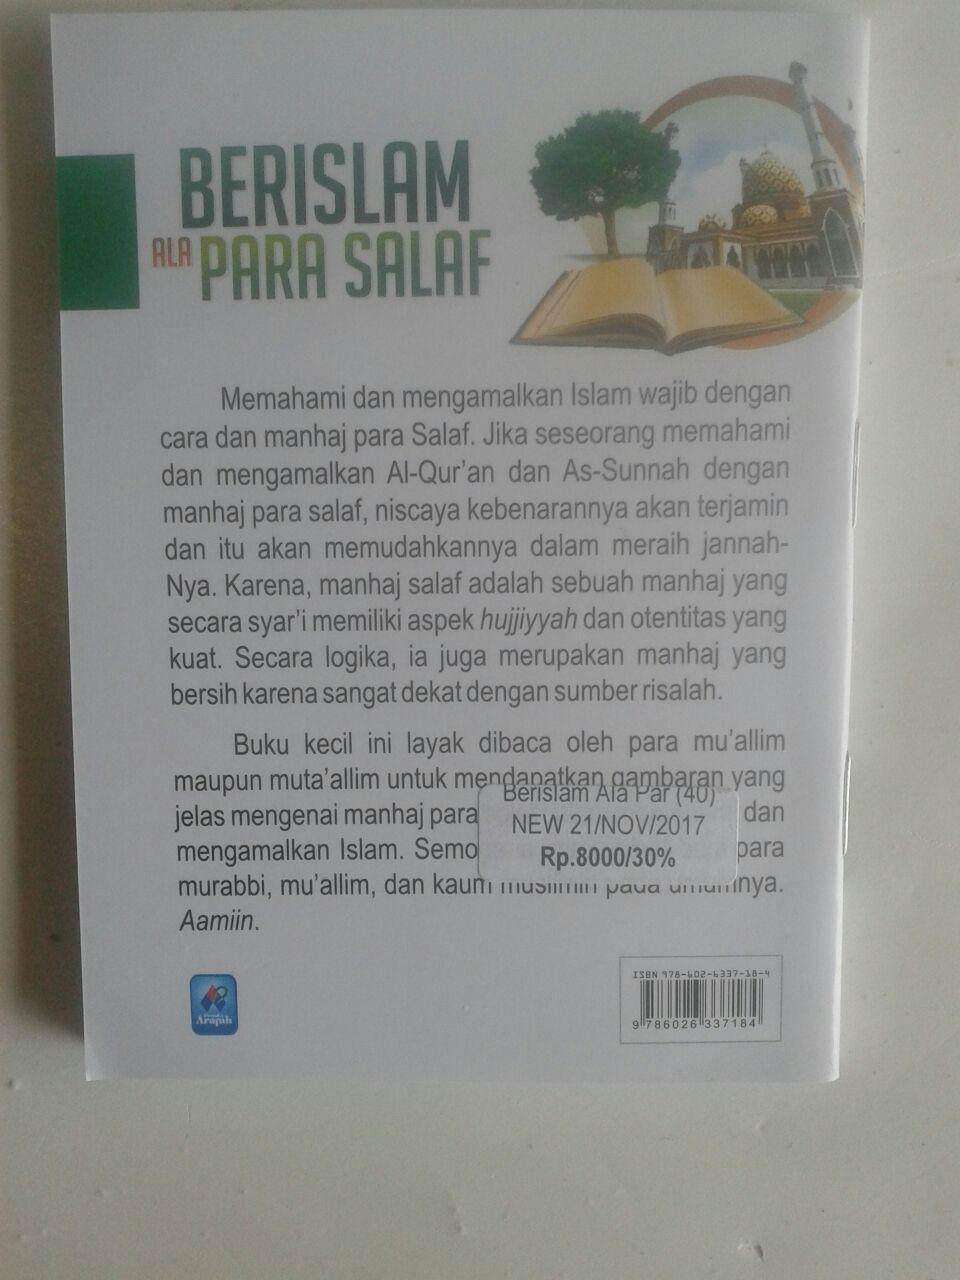 Buku Saku Berislam Ala Para Salaf Cara Memahami Sumber Islam cover